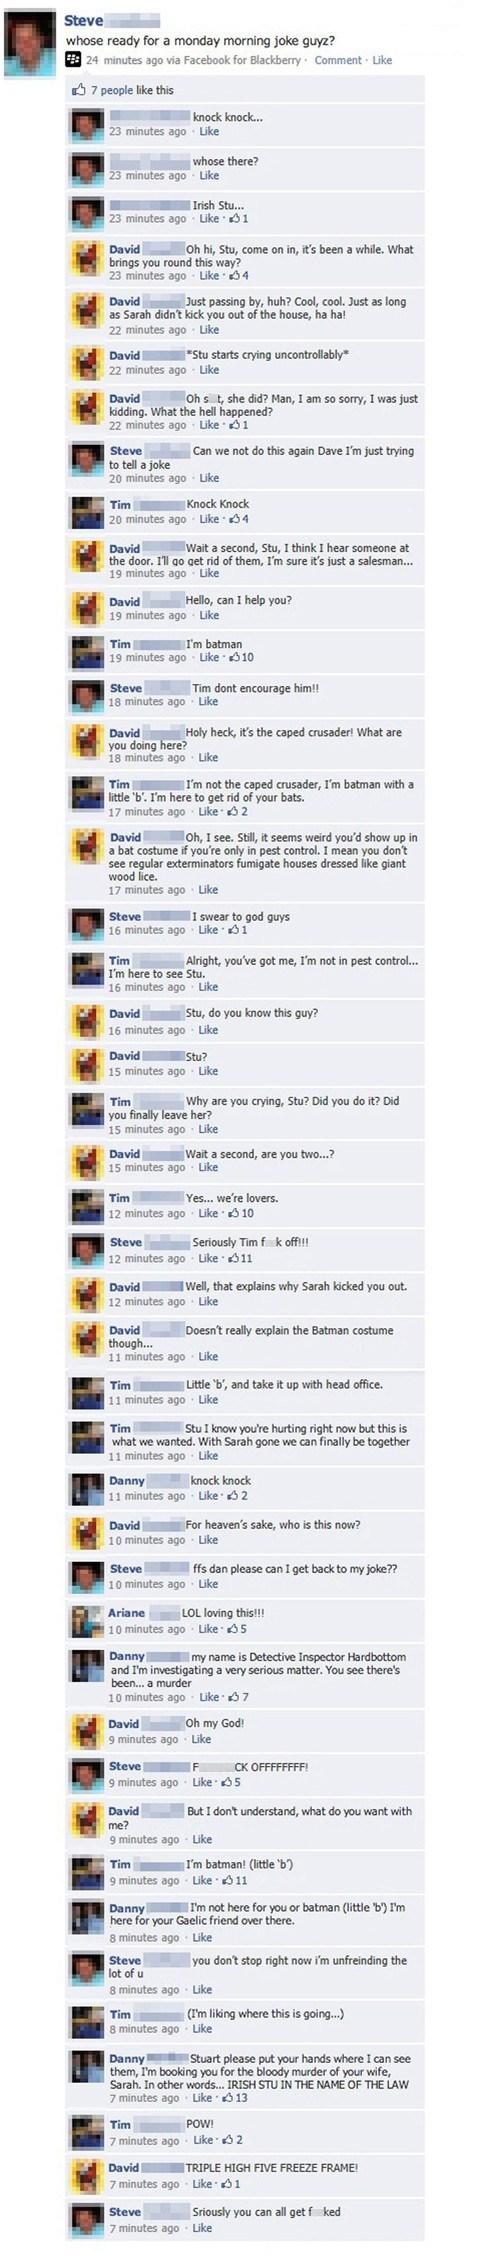 joke, facebook, comments, knock knock, lol